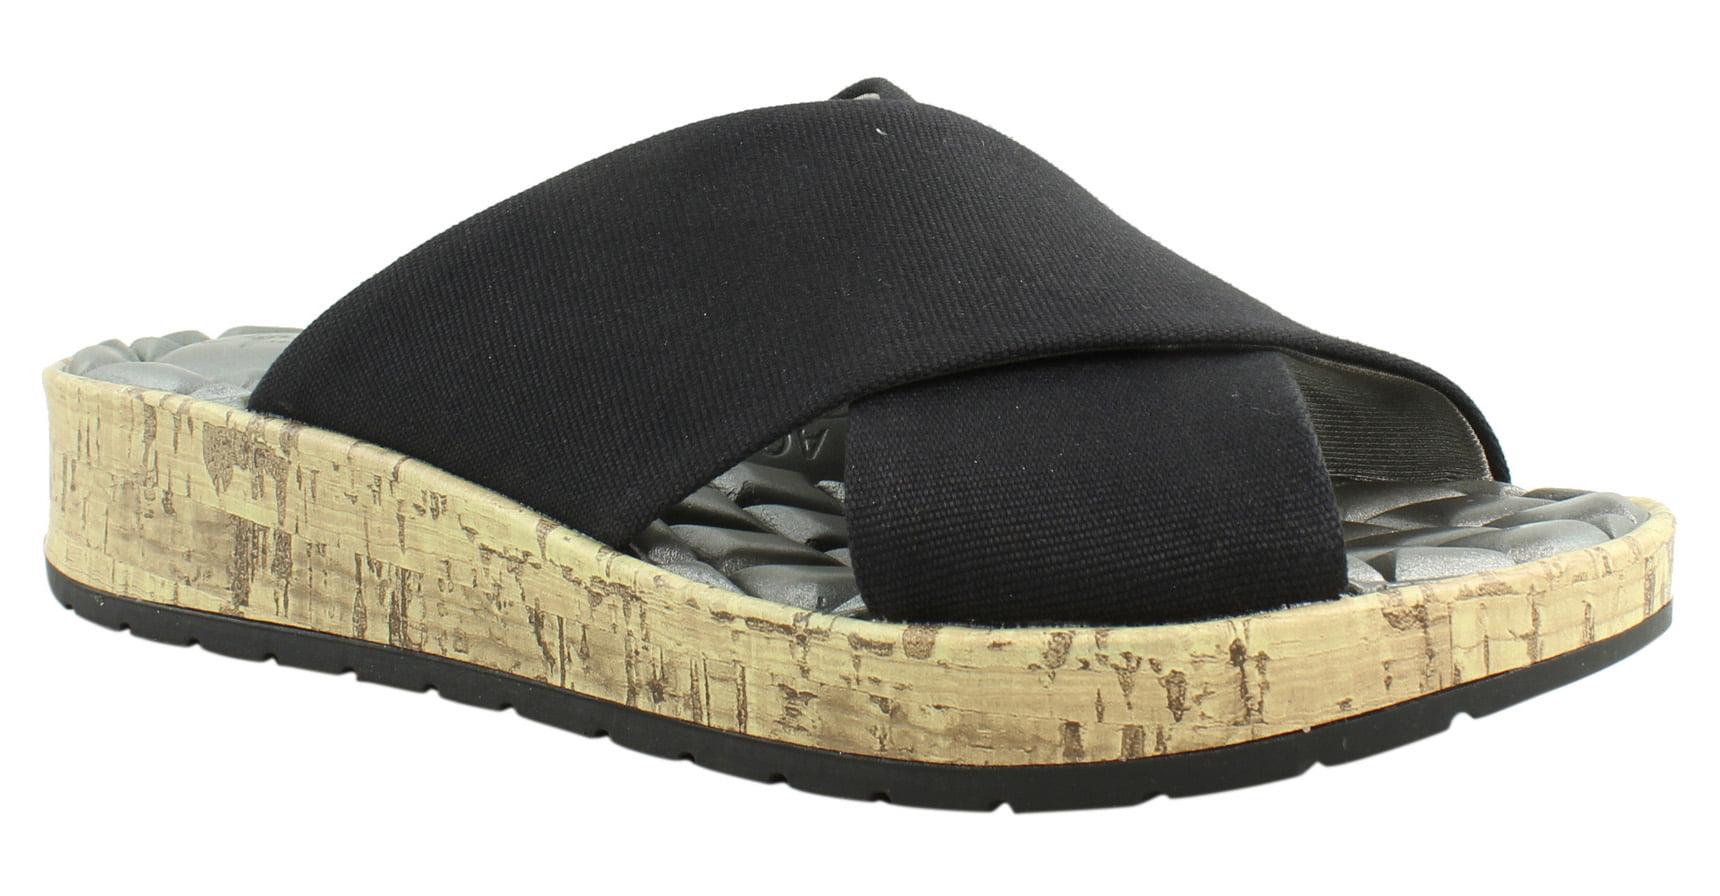 Lifestride Womens Black Slide Sandals Size 6 New by LifeStride